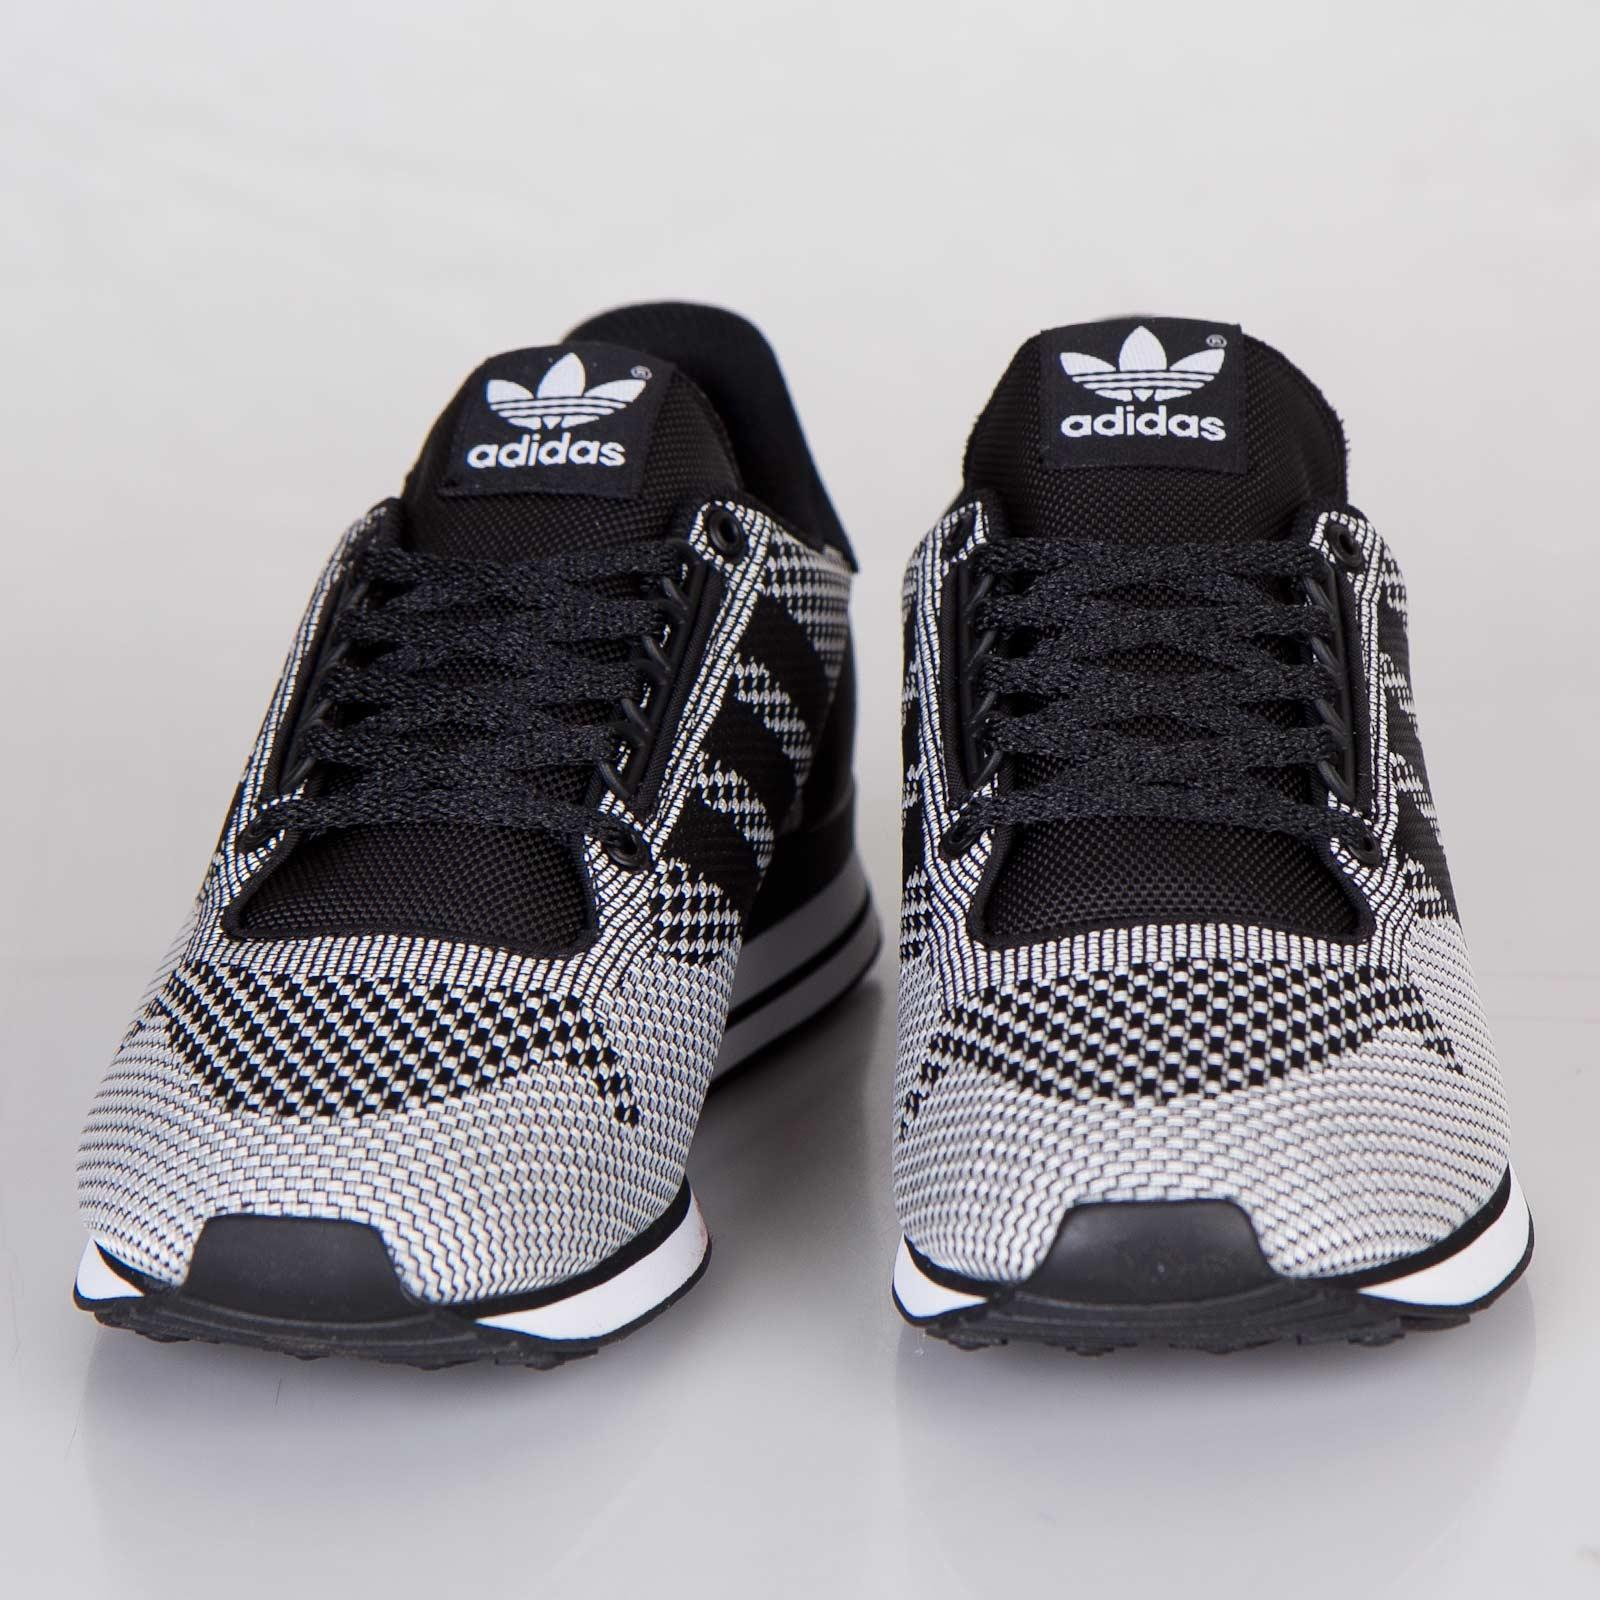 9f15814804adb adidas ZX 500 OG Weave - M20993 - Sneakersnstuff